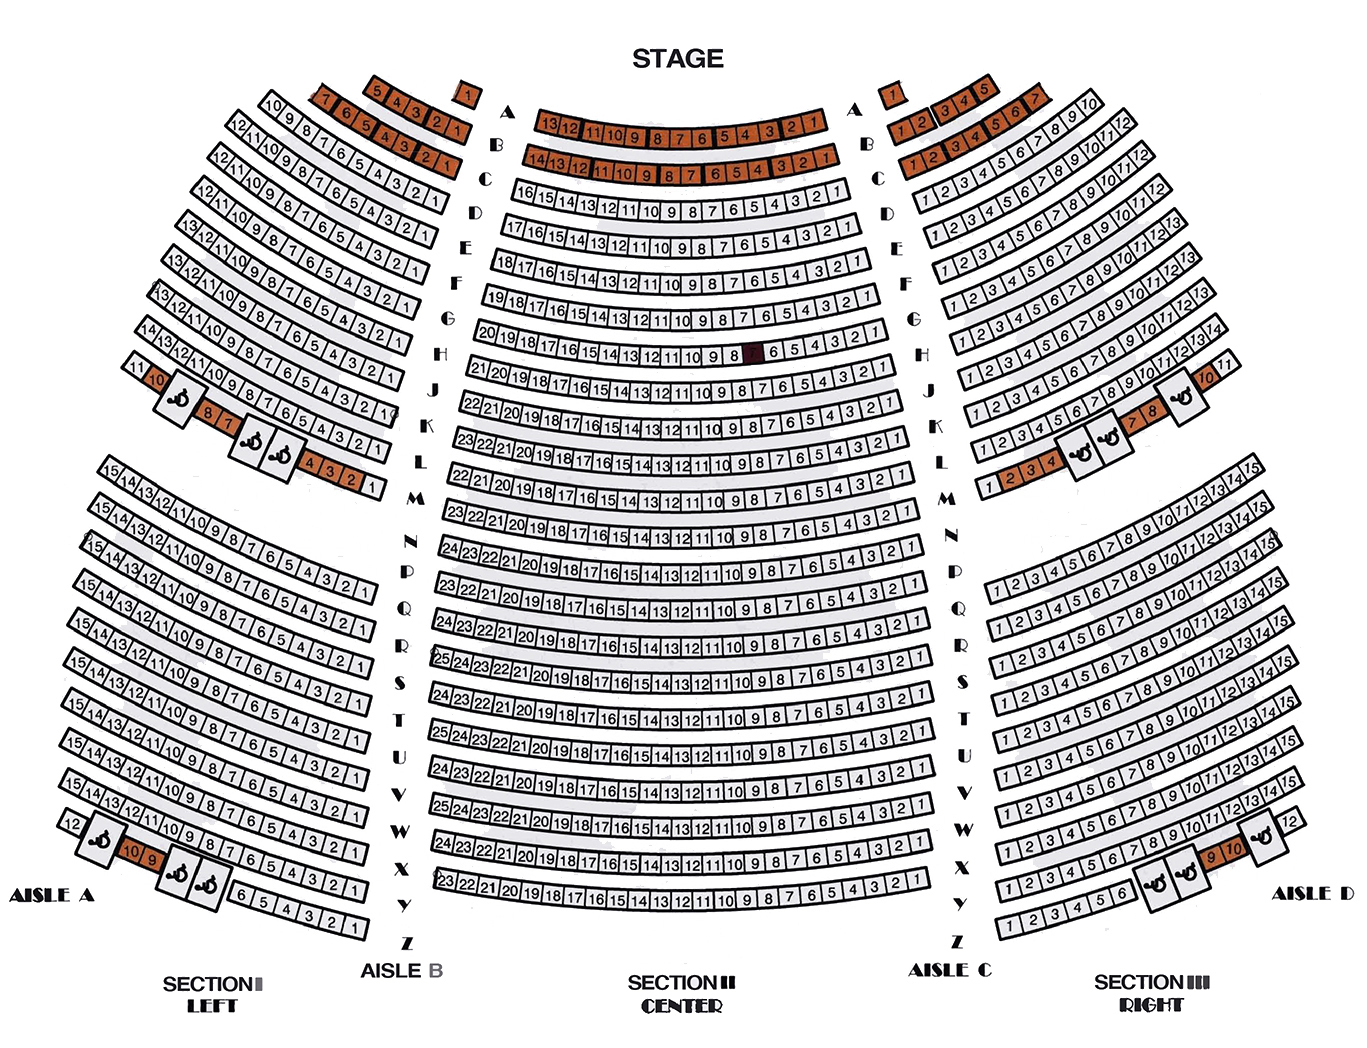 Rabobank Arena  Interactive concert Seating Chart